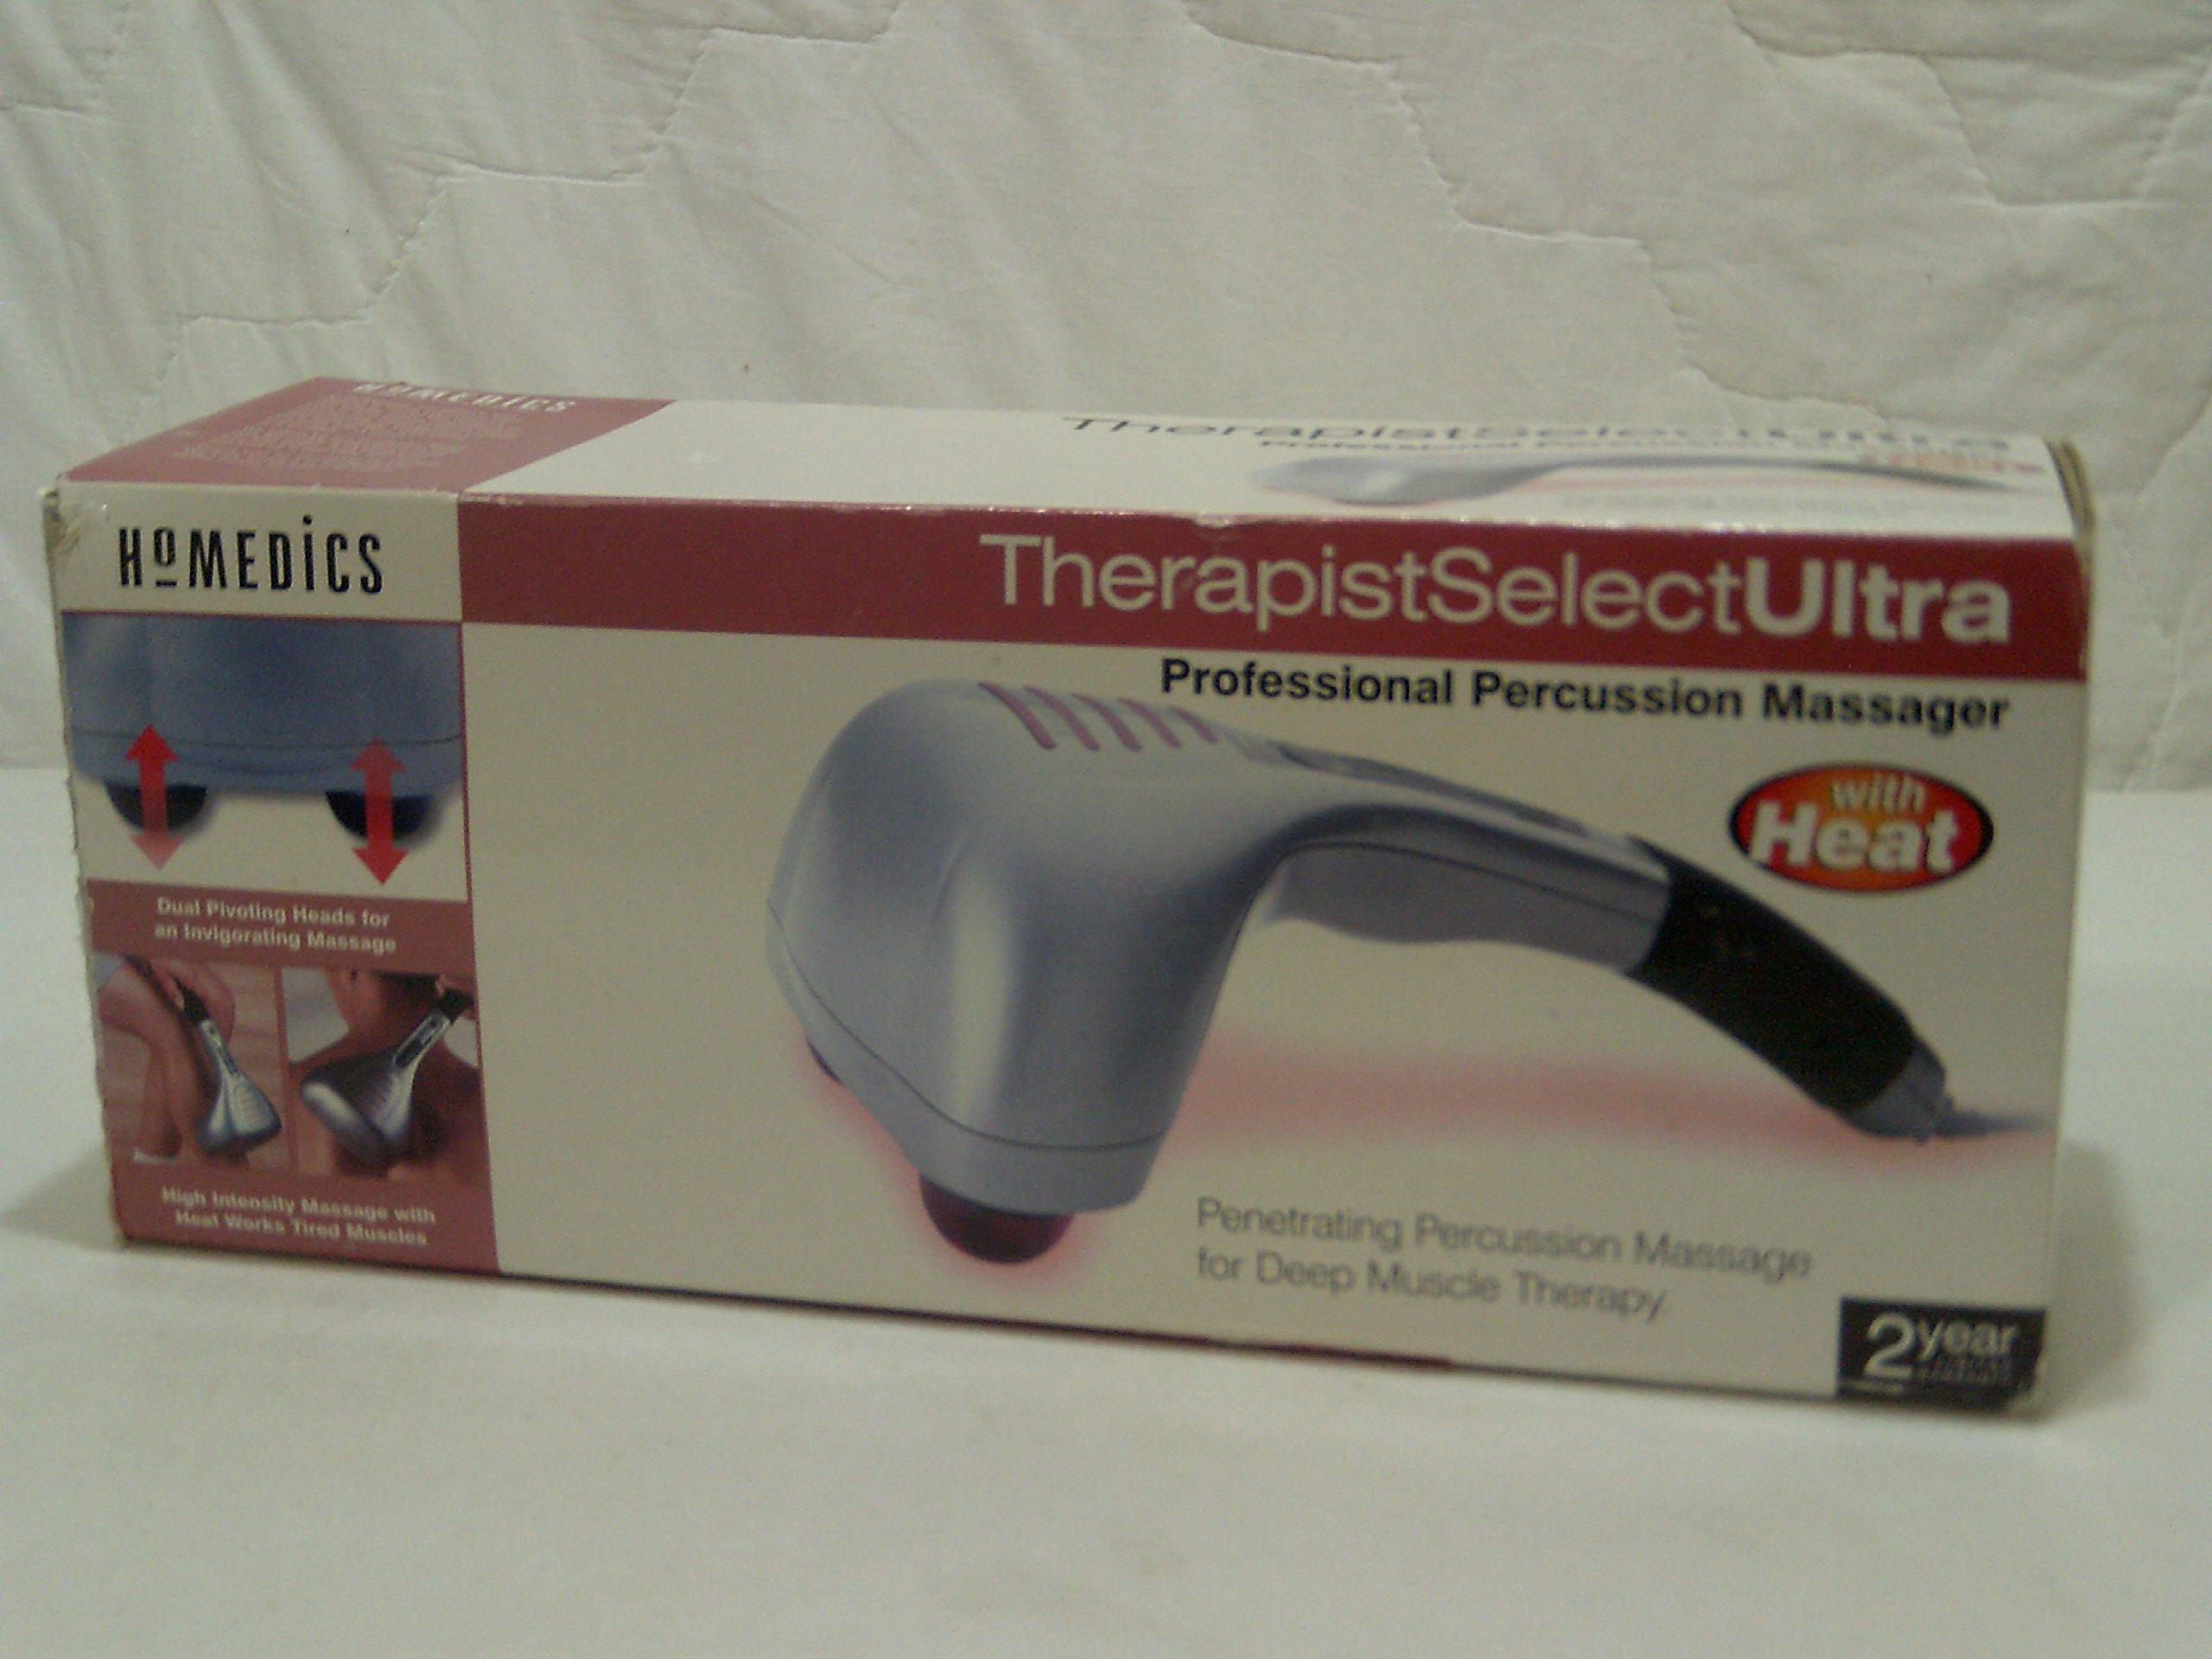 Homedics Therapist Select Ultra Professional Percussion Massager